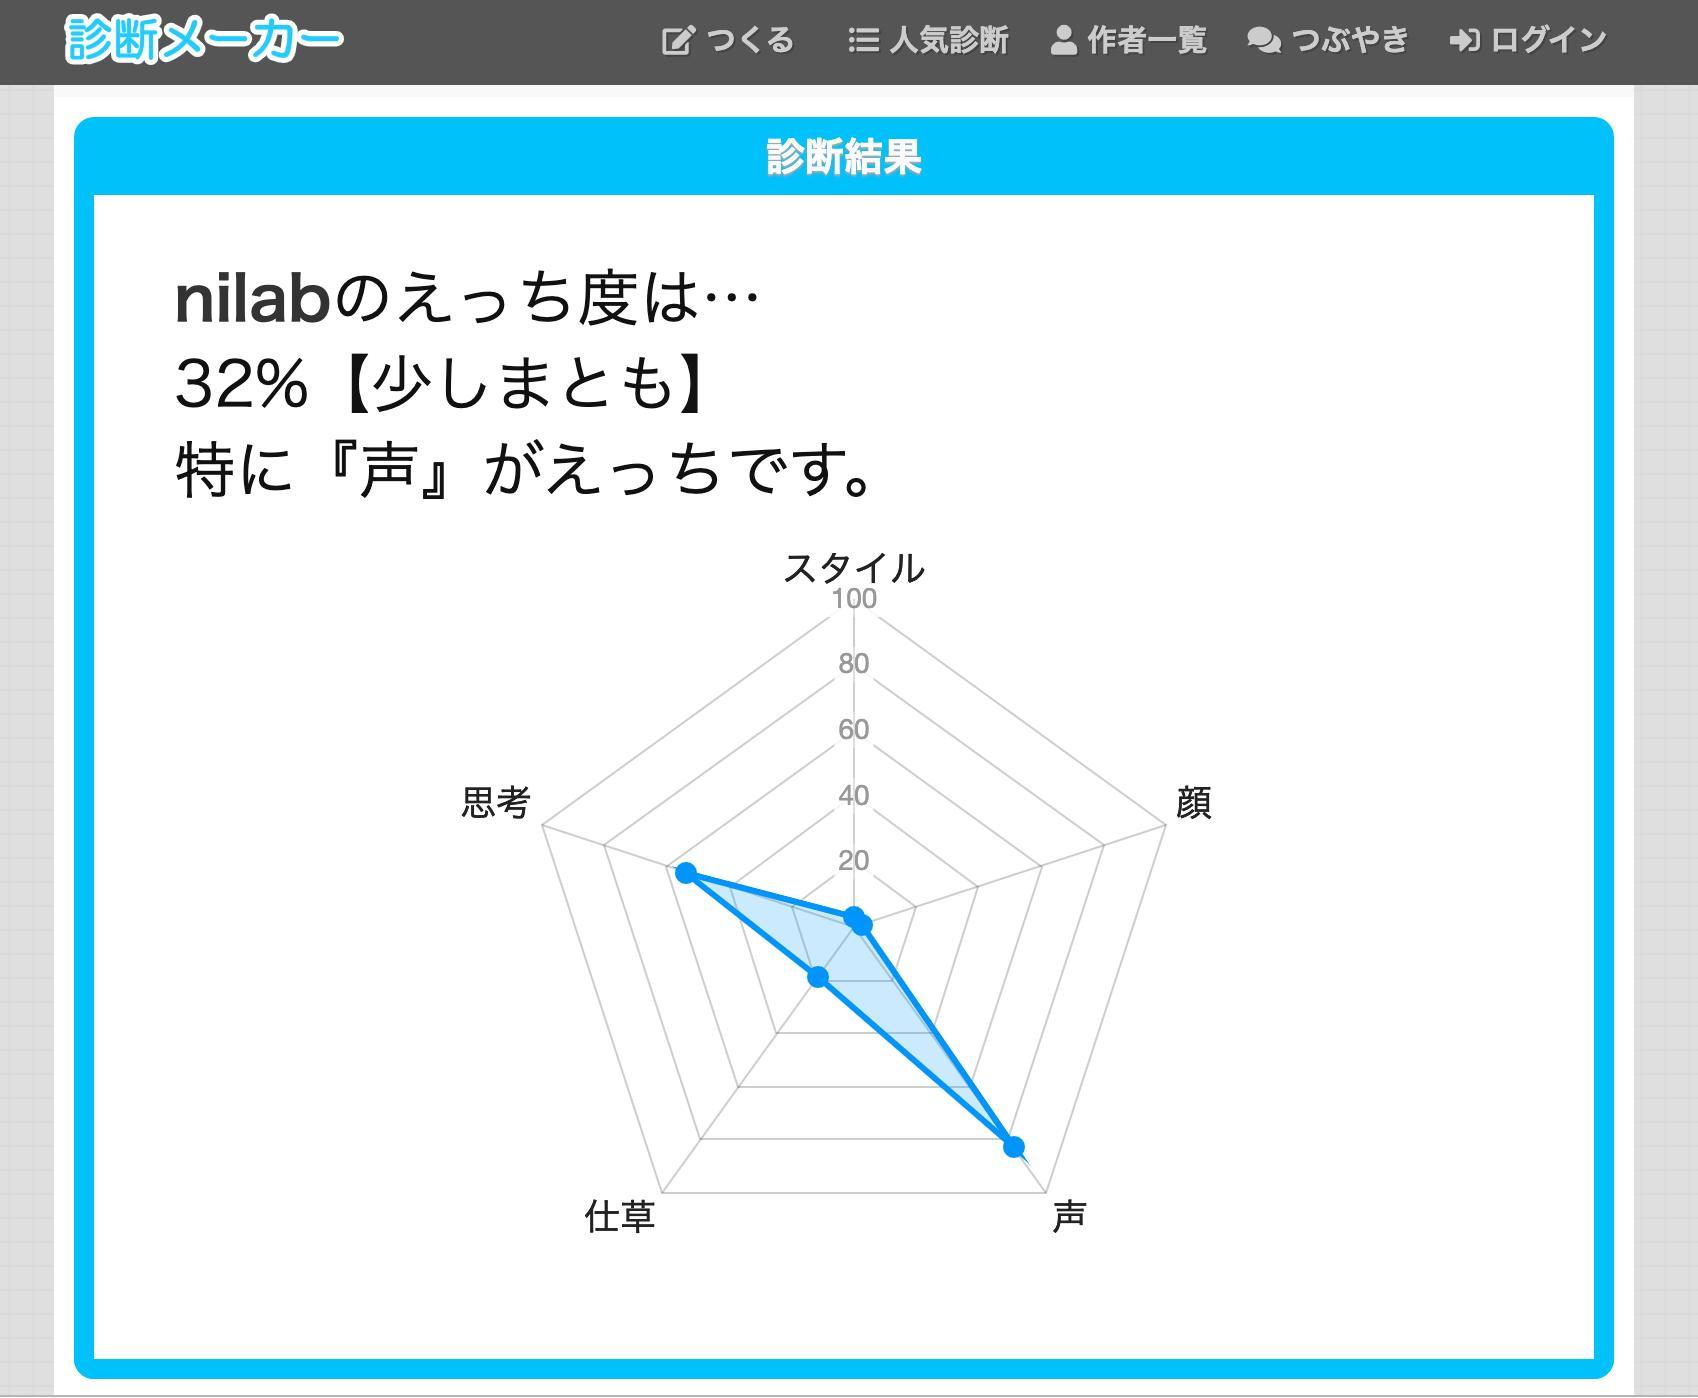 nilabのえっち度は… 32%【少しまとも】 特に『声』がえっちです。 https://t.co/tu6okHJI8j #あなたのH度を計測 https://t.co/MQWGBJUntW  ( ´∀`) https://t.co/e3h3opCpda